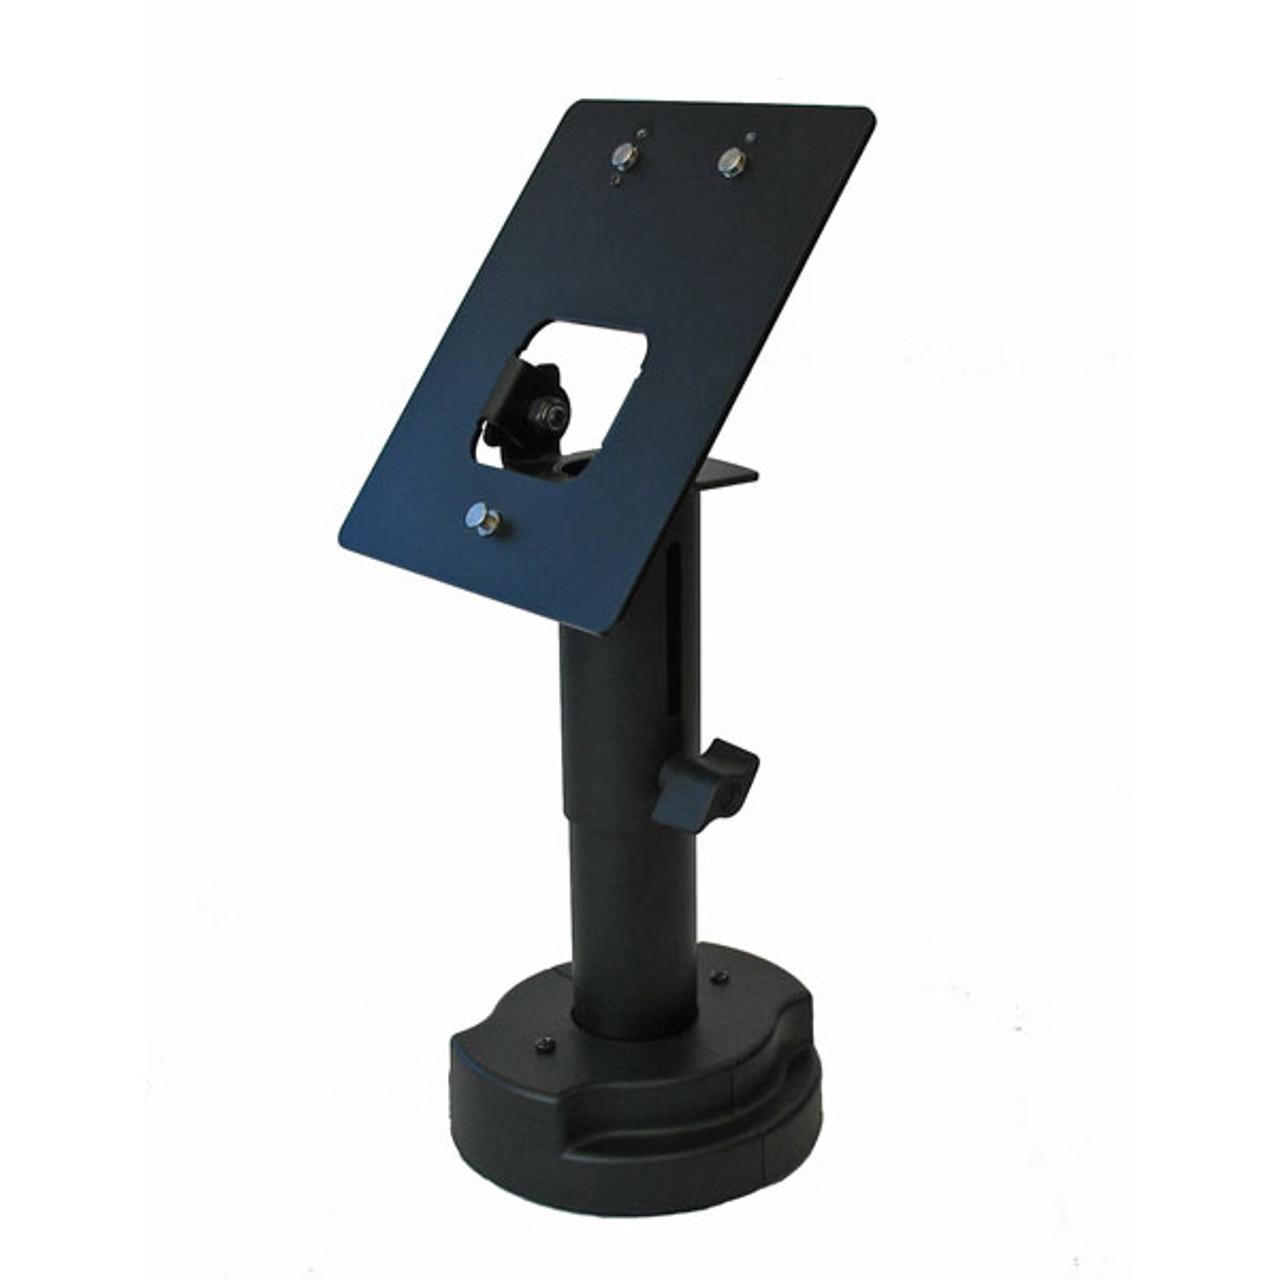 Swivel Stands Credit Card Stand Telescoping Pedestal Equinox L5200